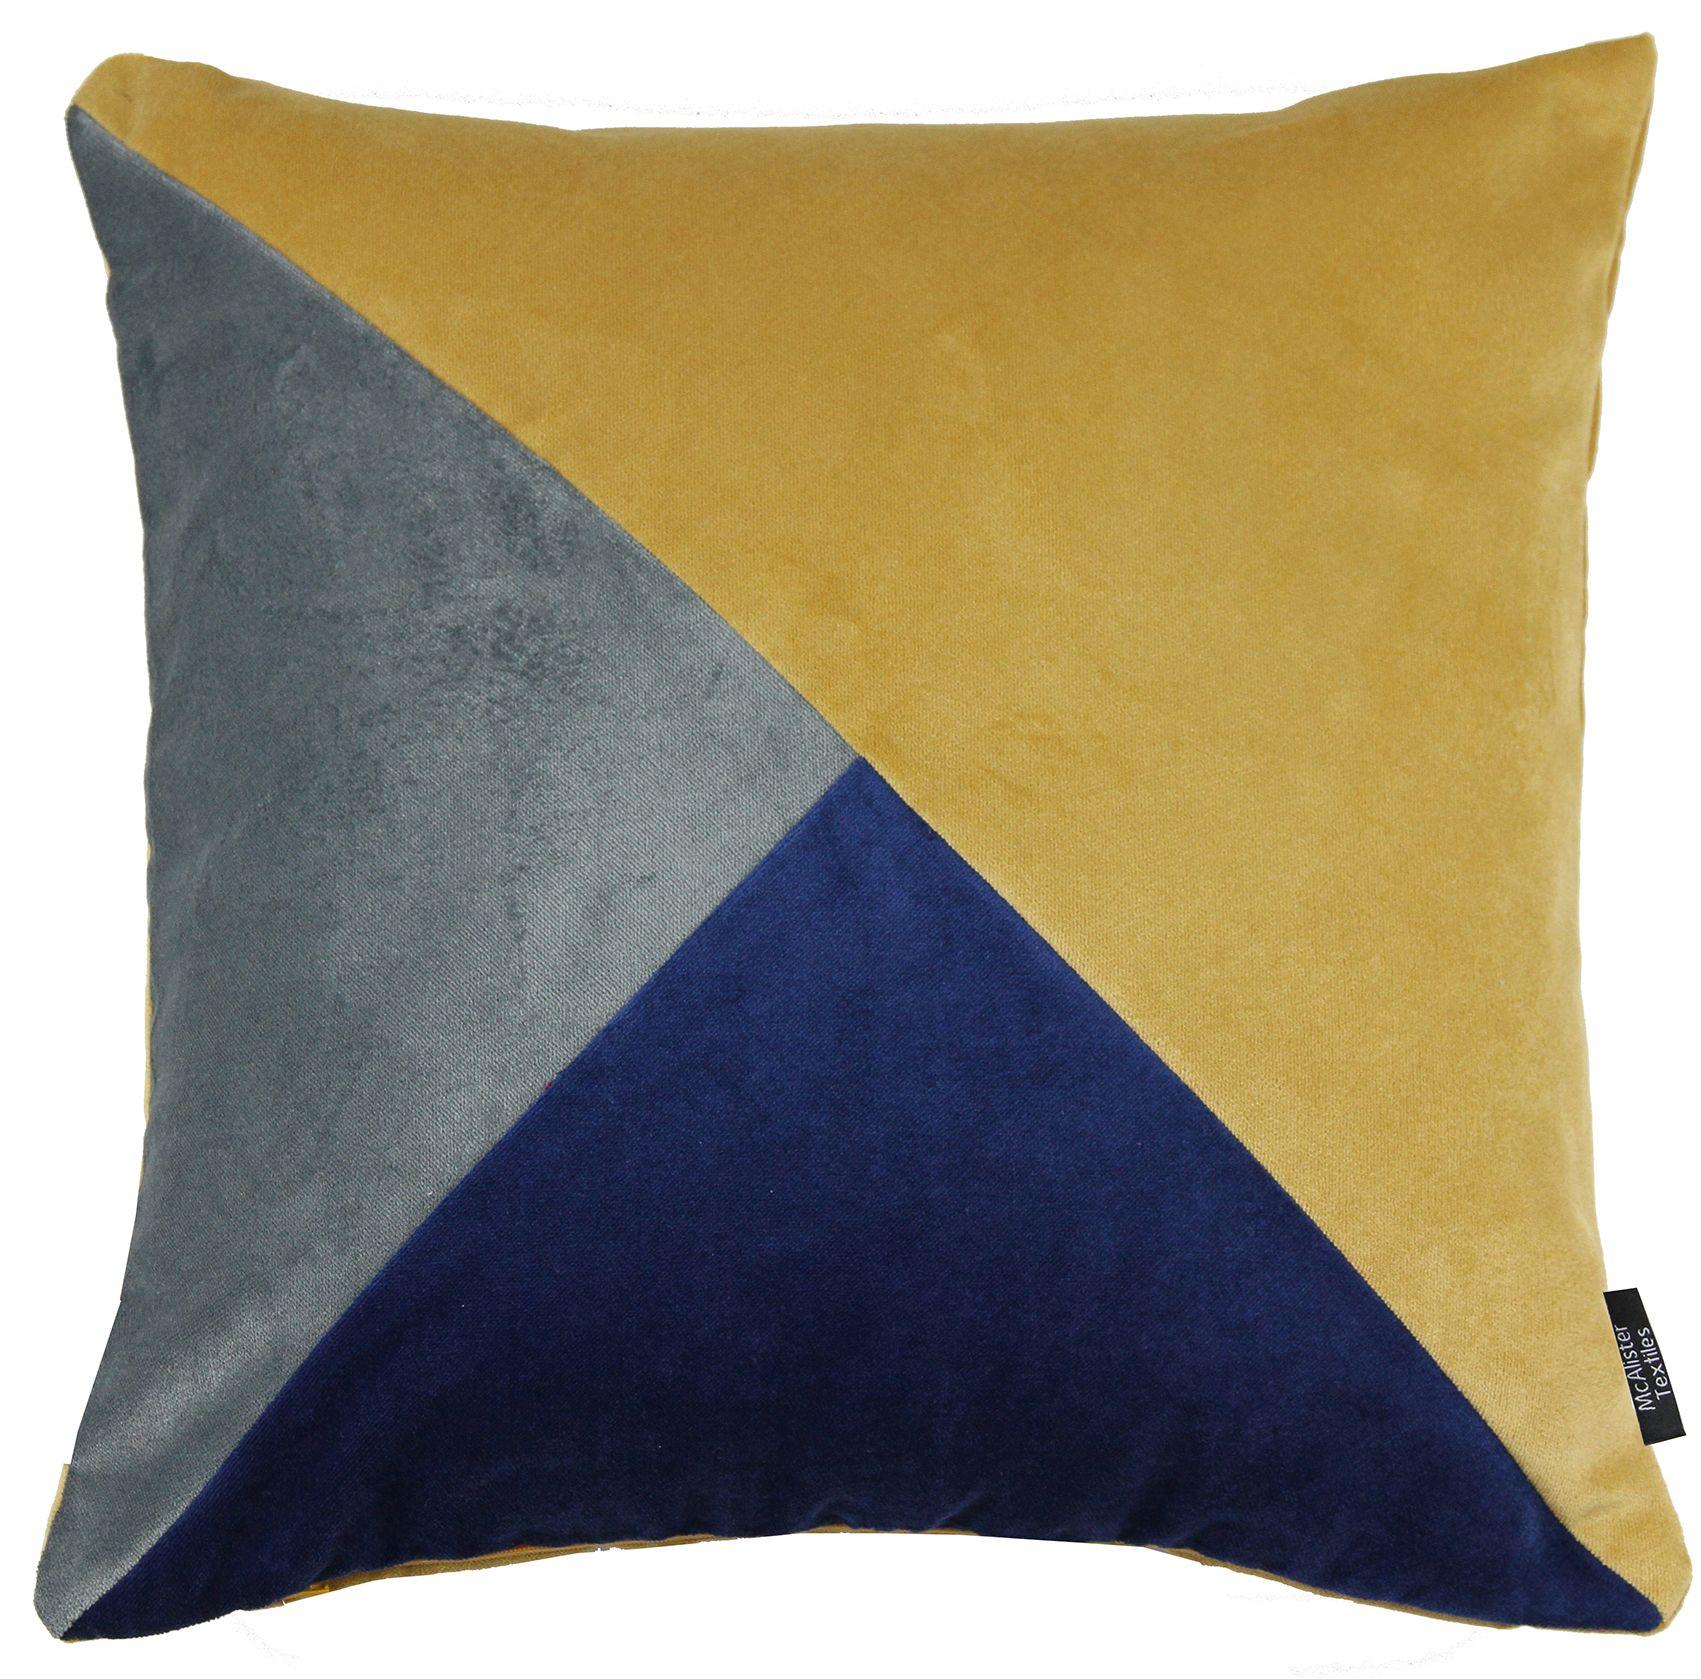 Diagonal Patchwork Velvet Navy Yellow Grey Cushion In